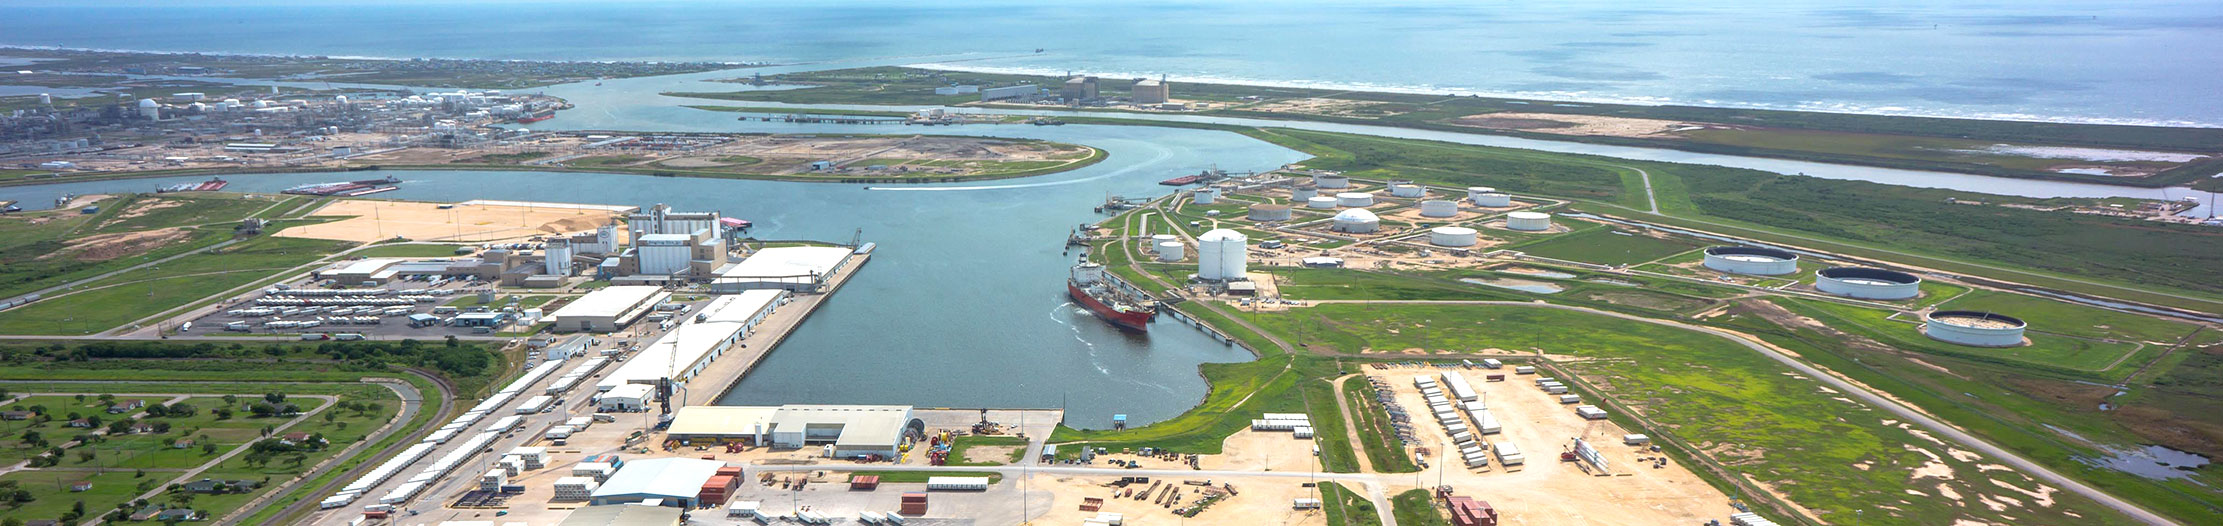 port freeport infrastructure